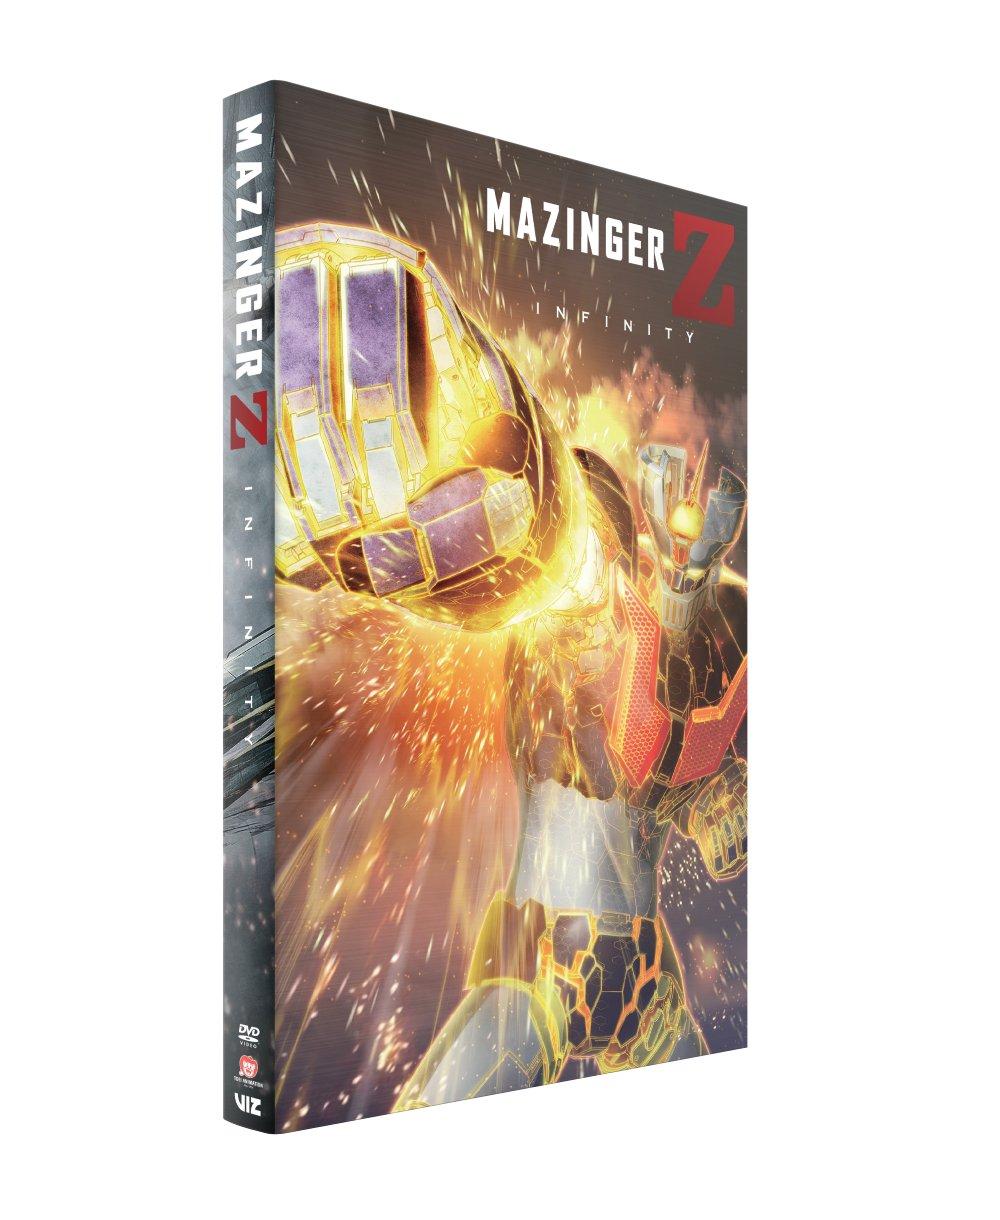 Mazinger Z Infinity DVD